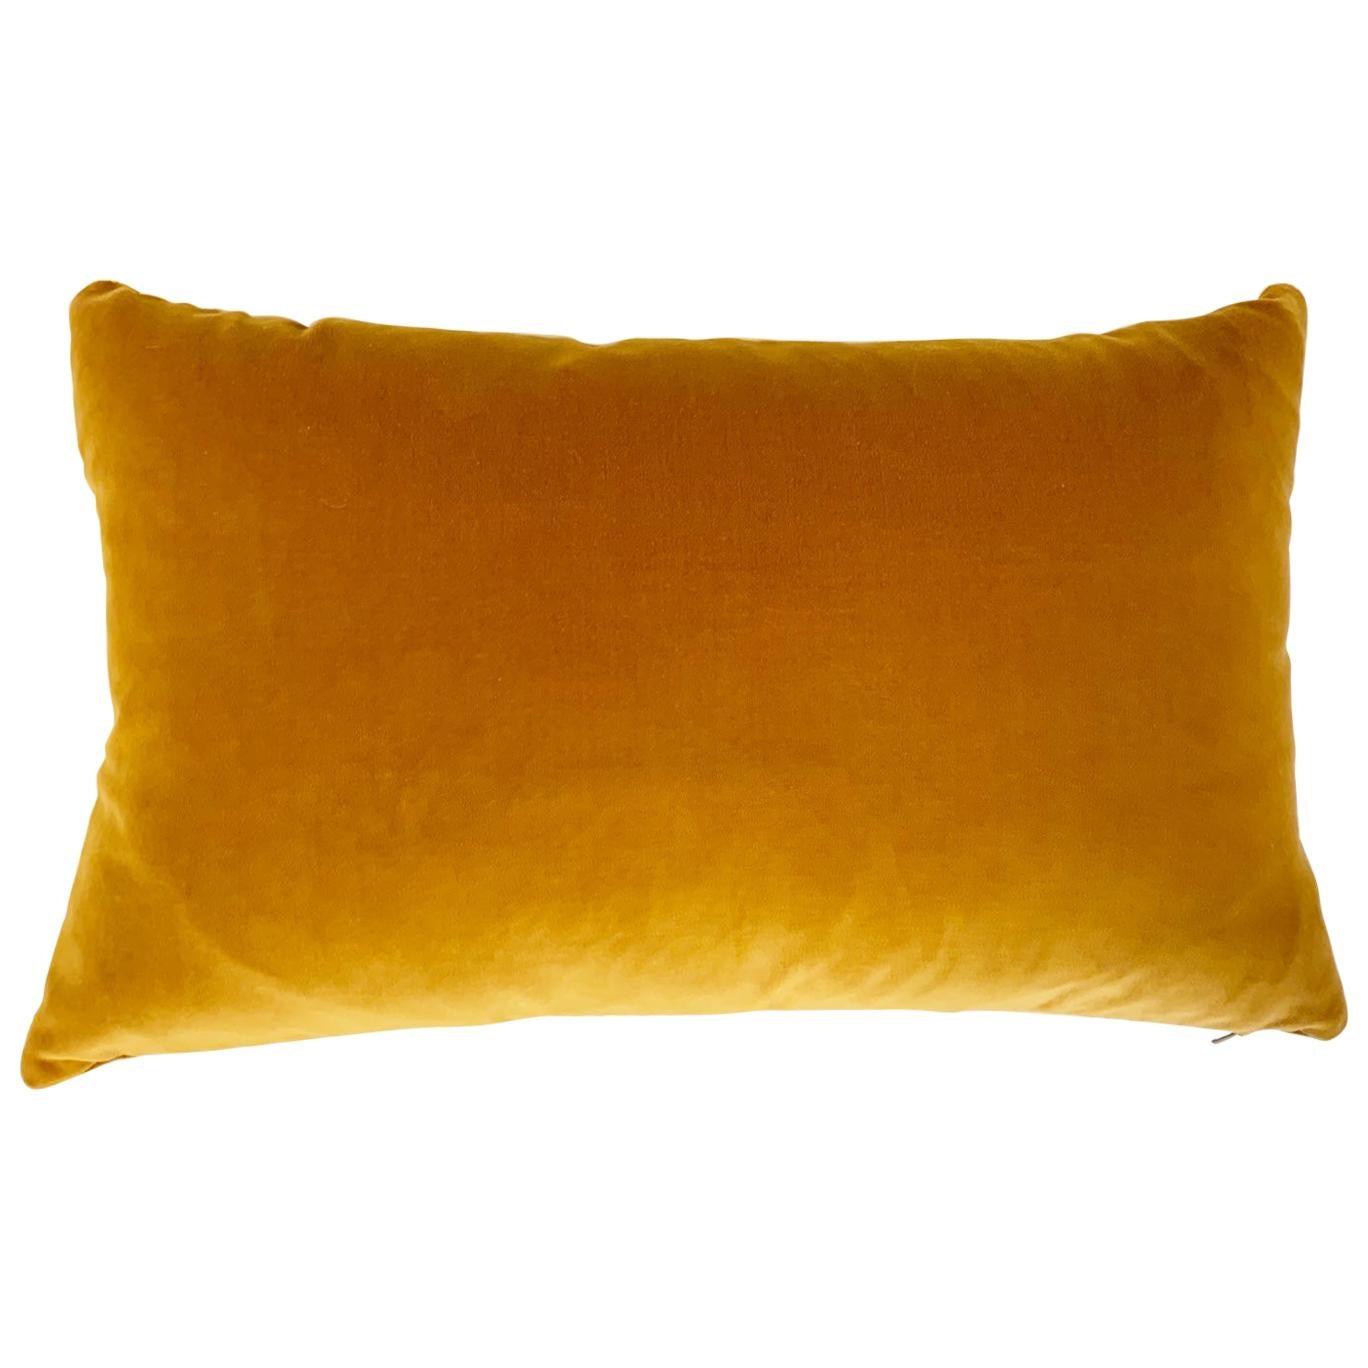 Loro Piana Velvet Pillow